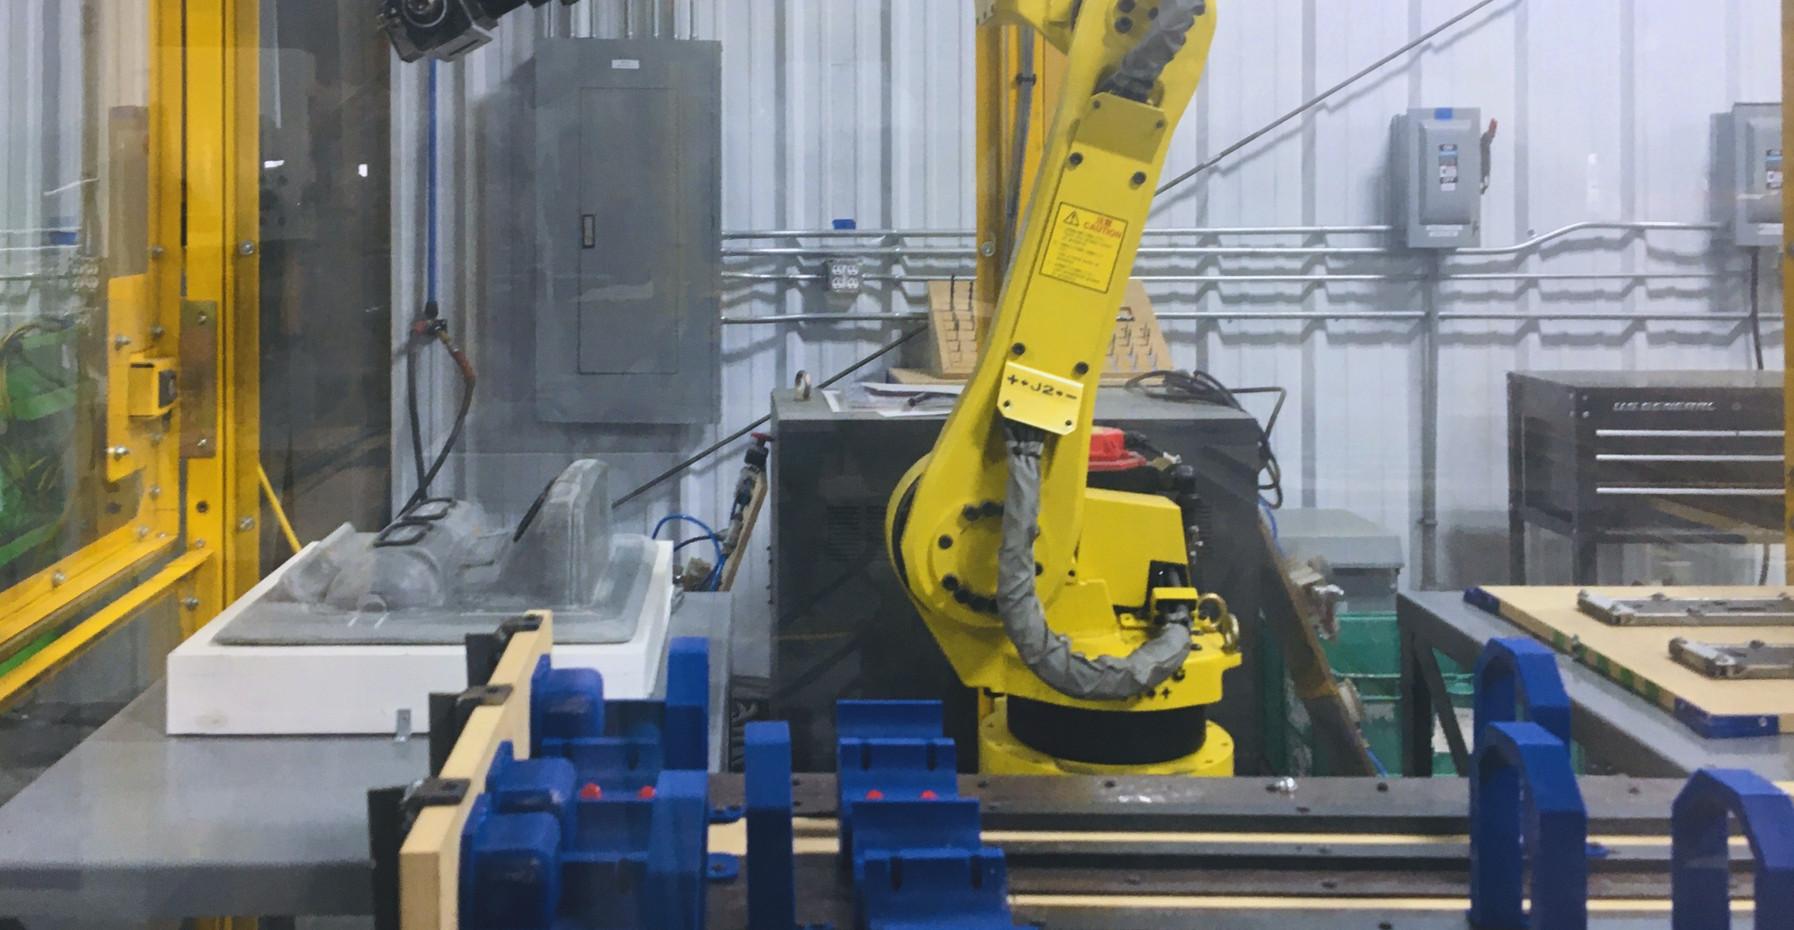 Robotic Manufacturing System